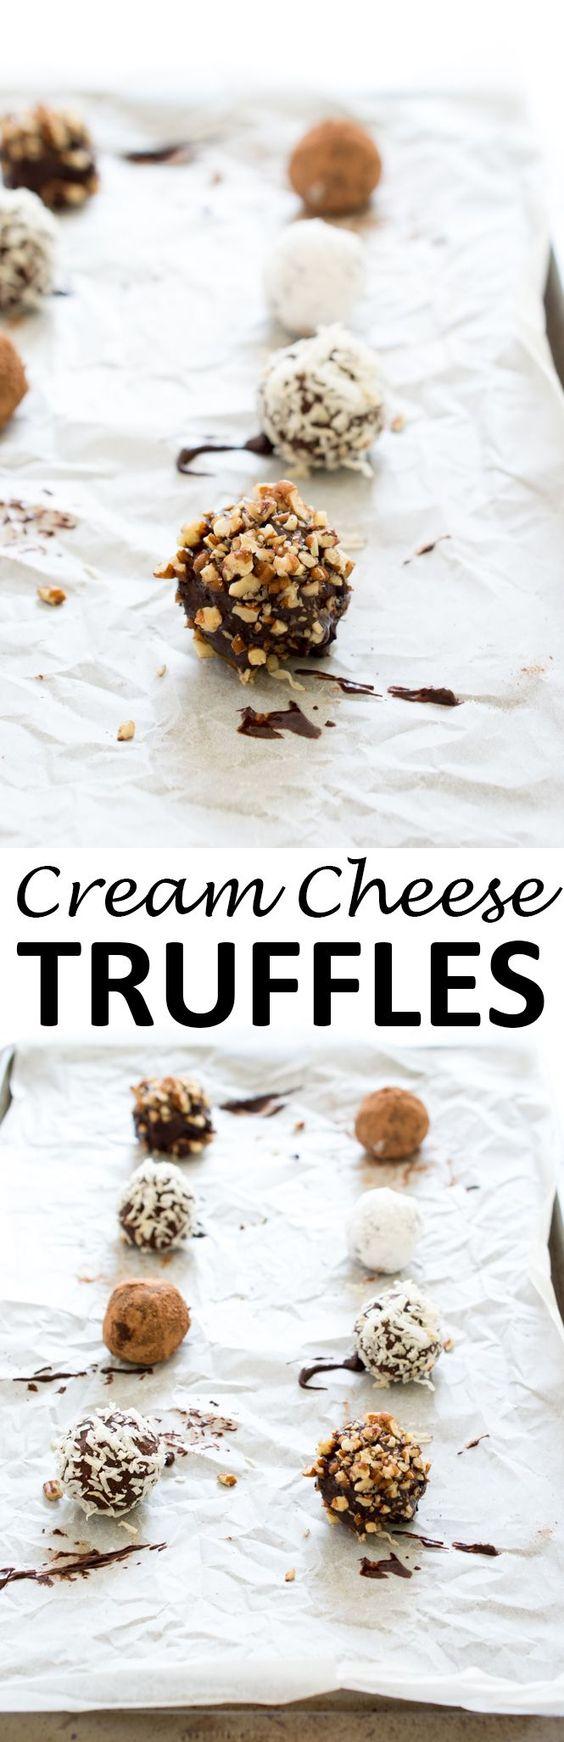 cream dessert chocolate desserts chocolate truffles truffle dessert ...